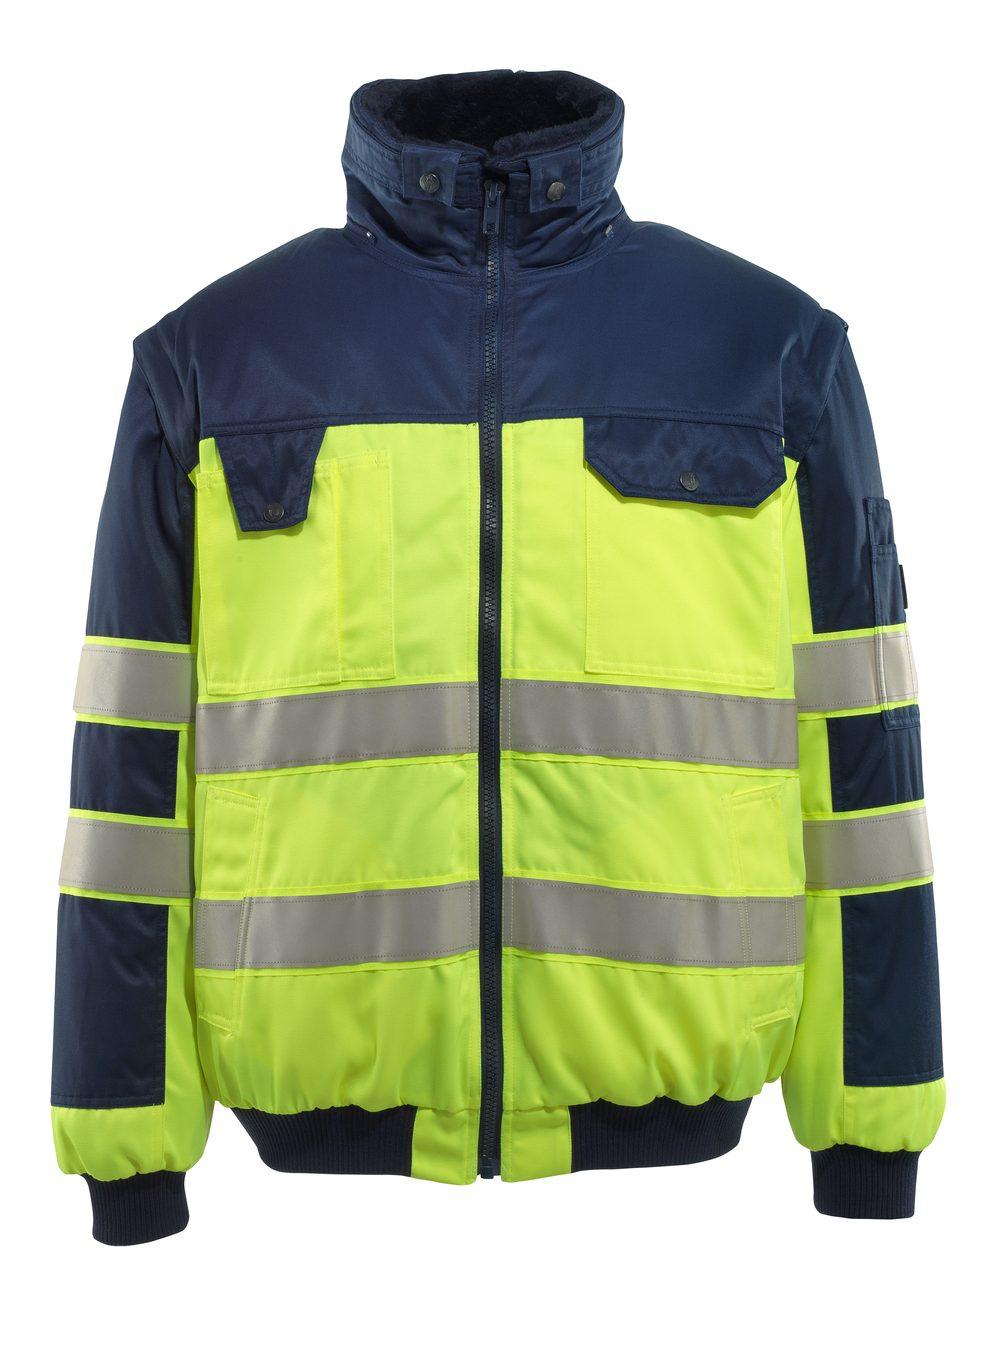 Livigno Pilot Jacket Hi Vis Yellow/Navy